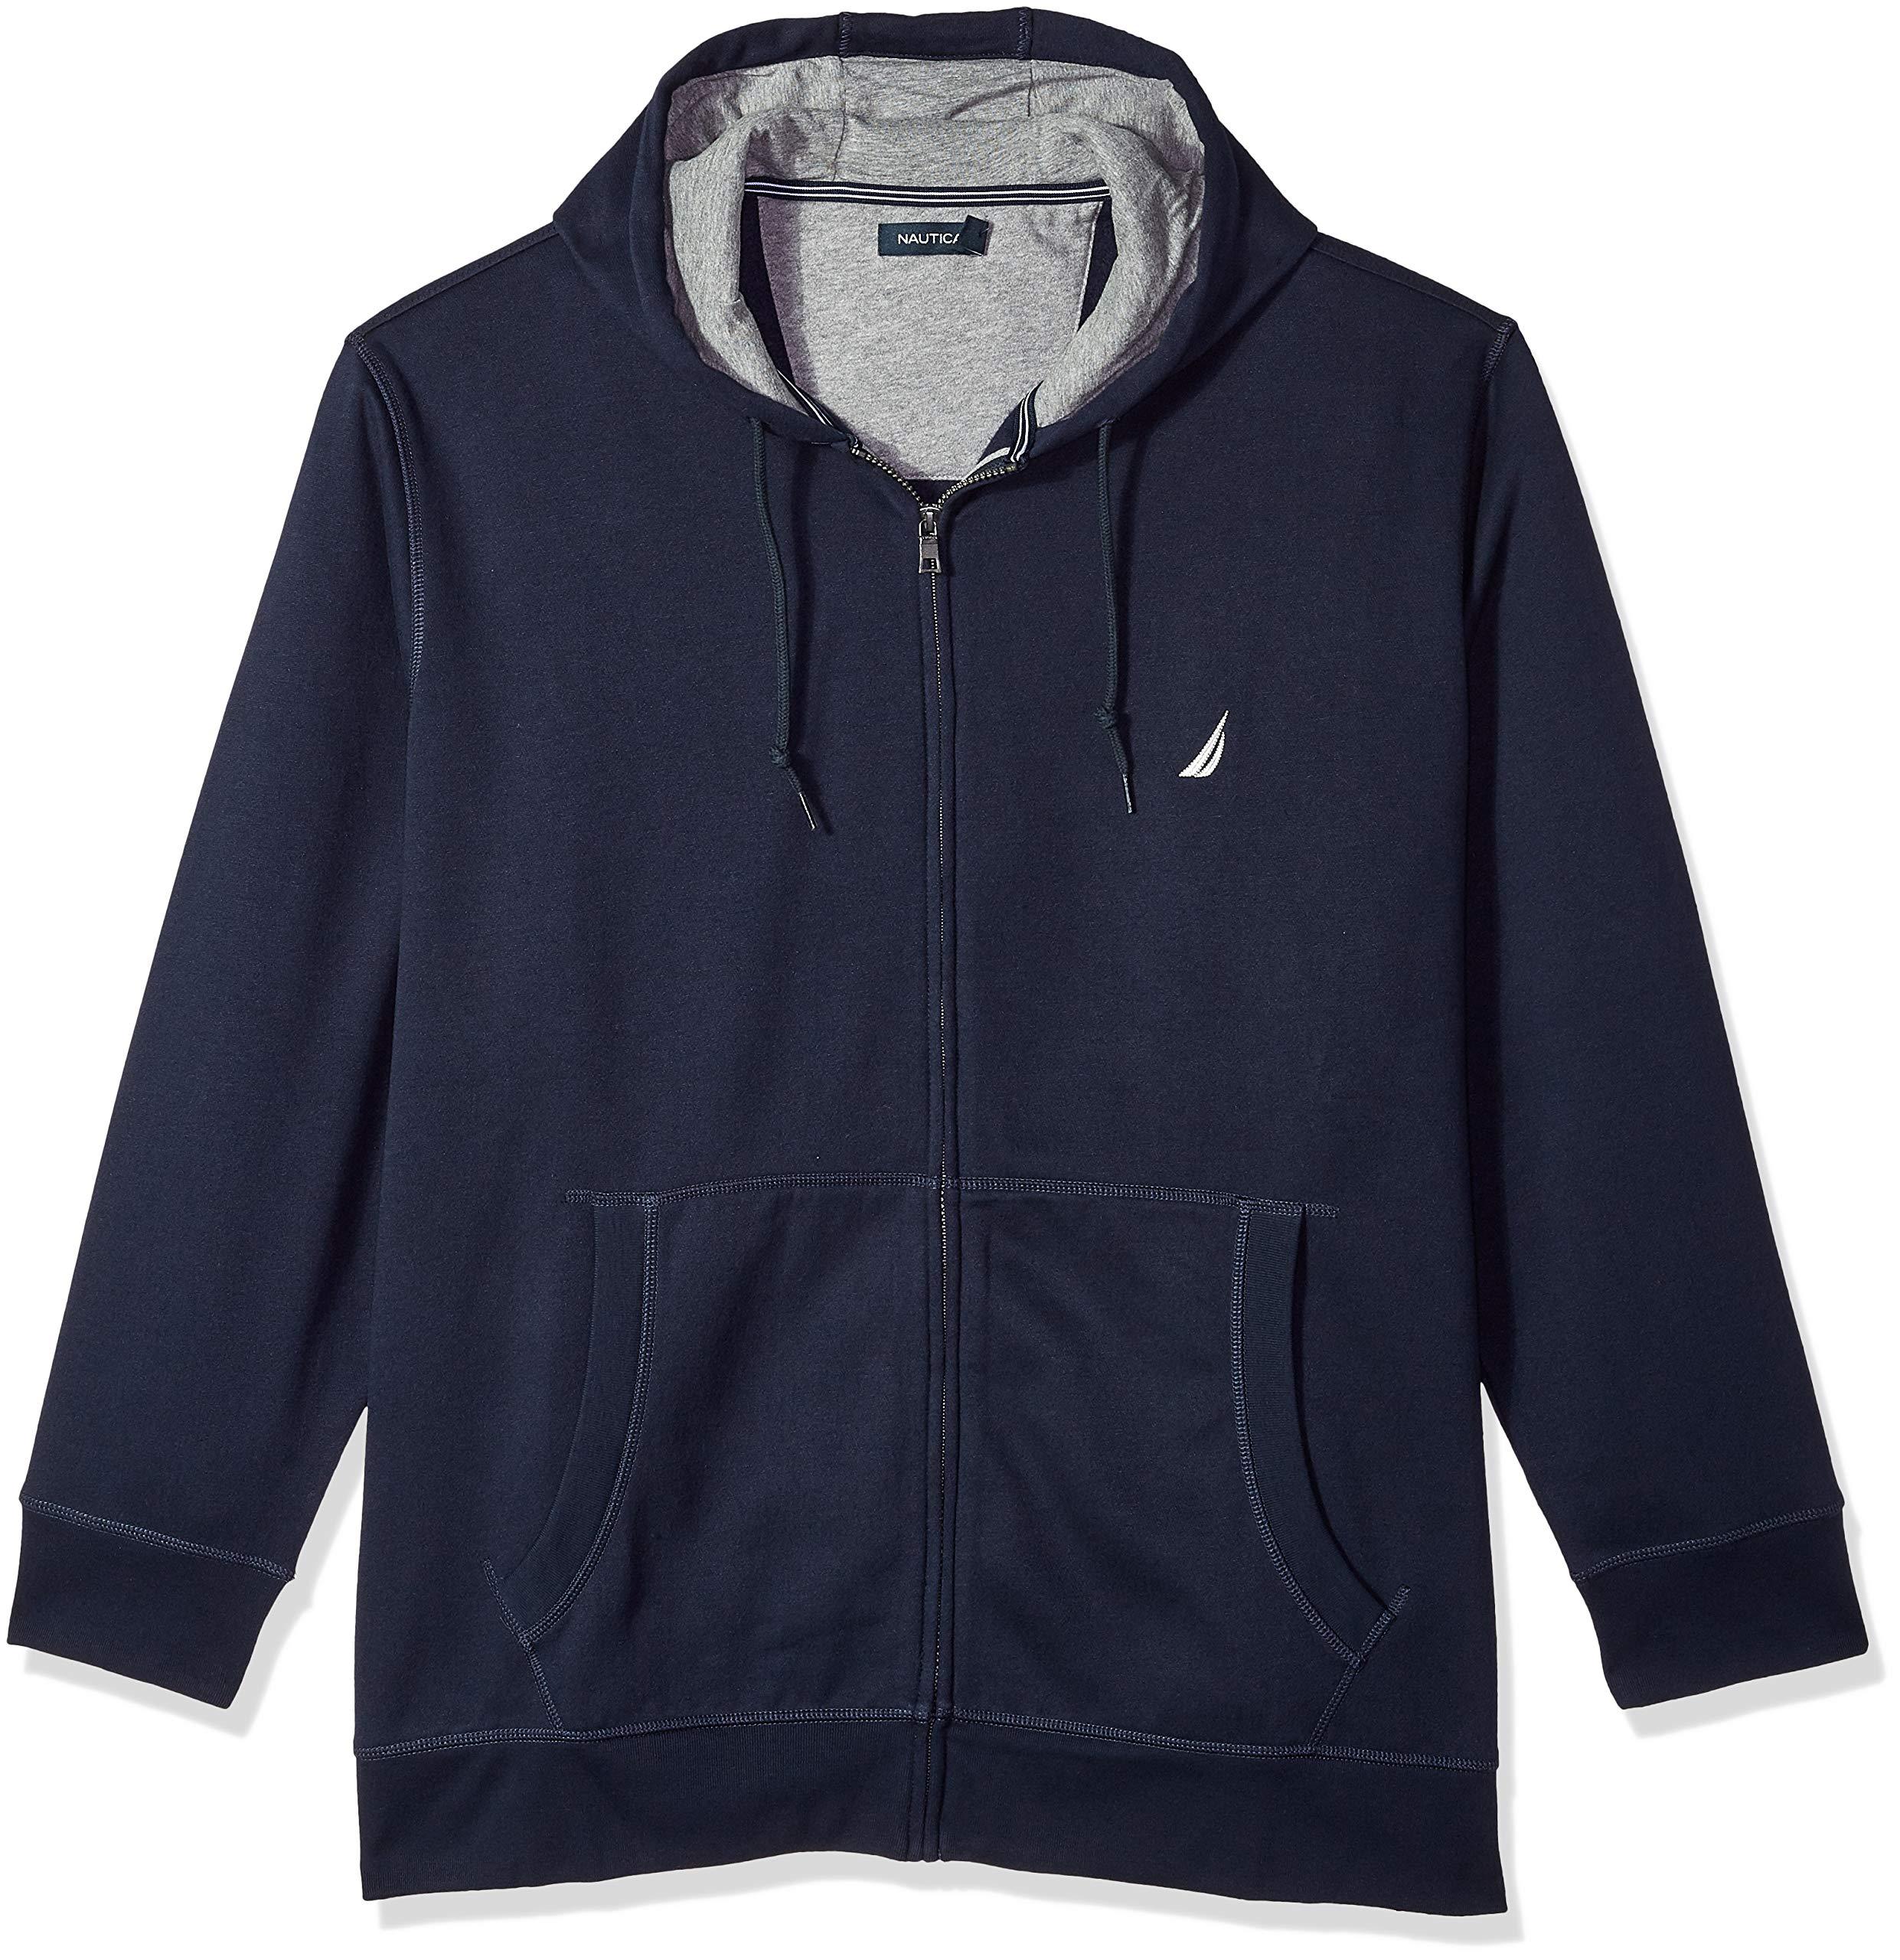 Nautica Men's Big and Tall Full-Zip Sweater Hoodie Sweatshirt, Navy 4XLT